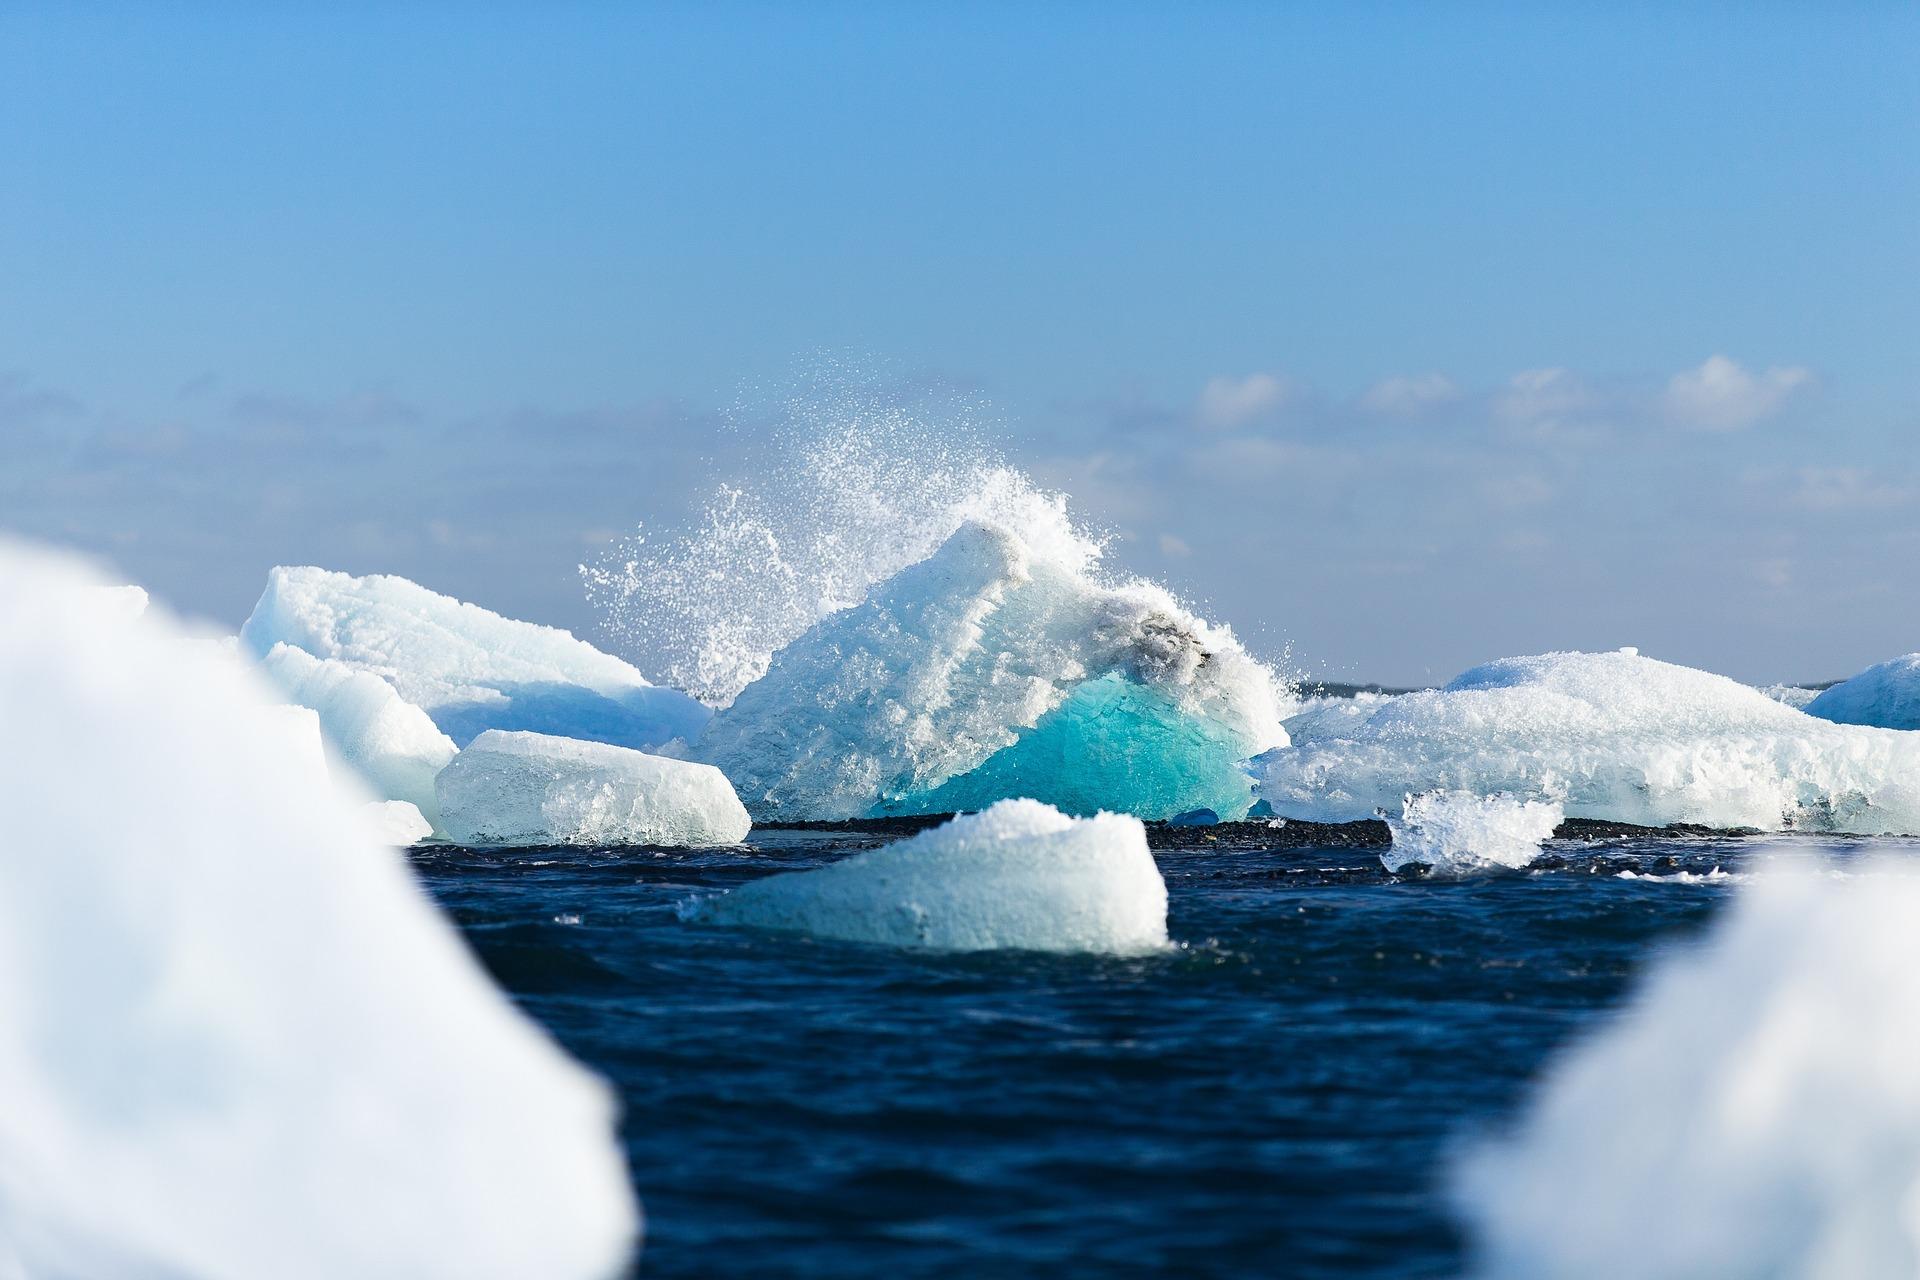 Autonomous technology exploring Antarctica's Ocean